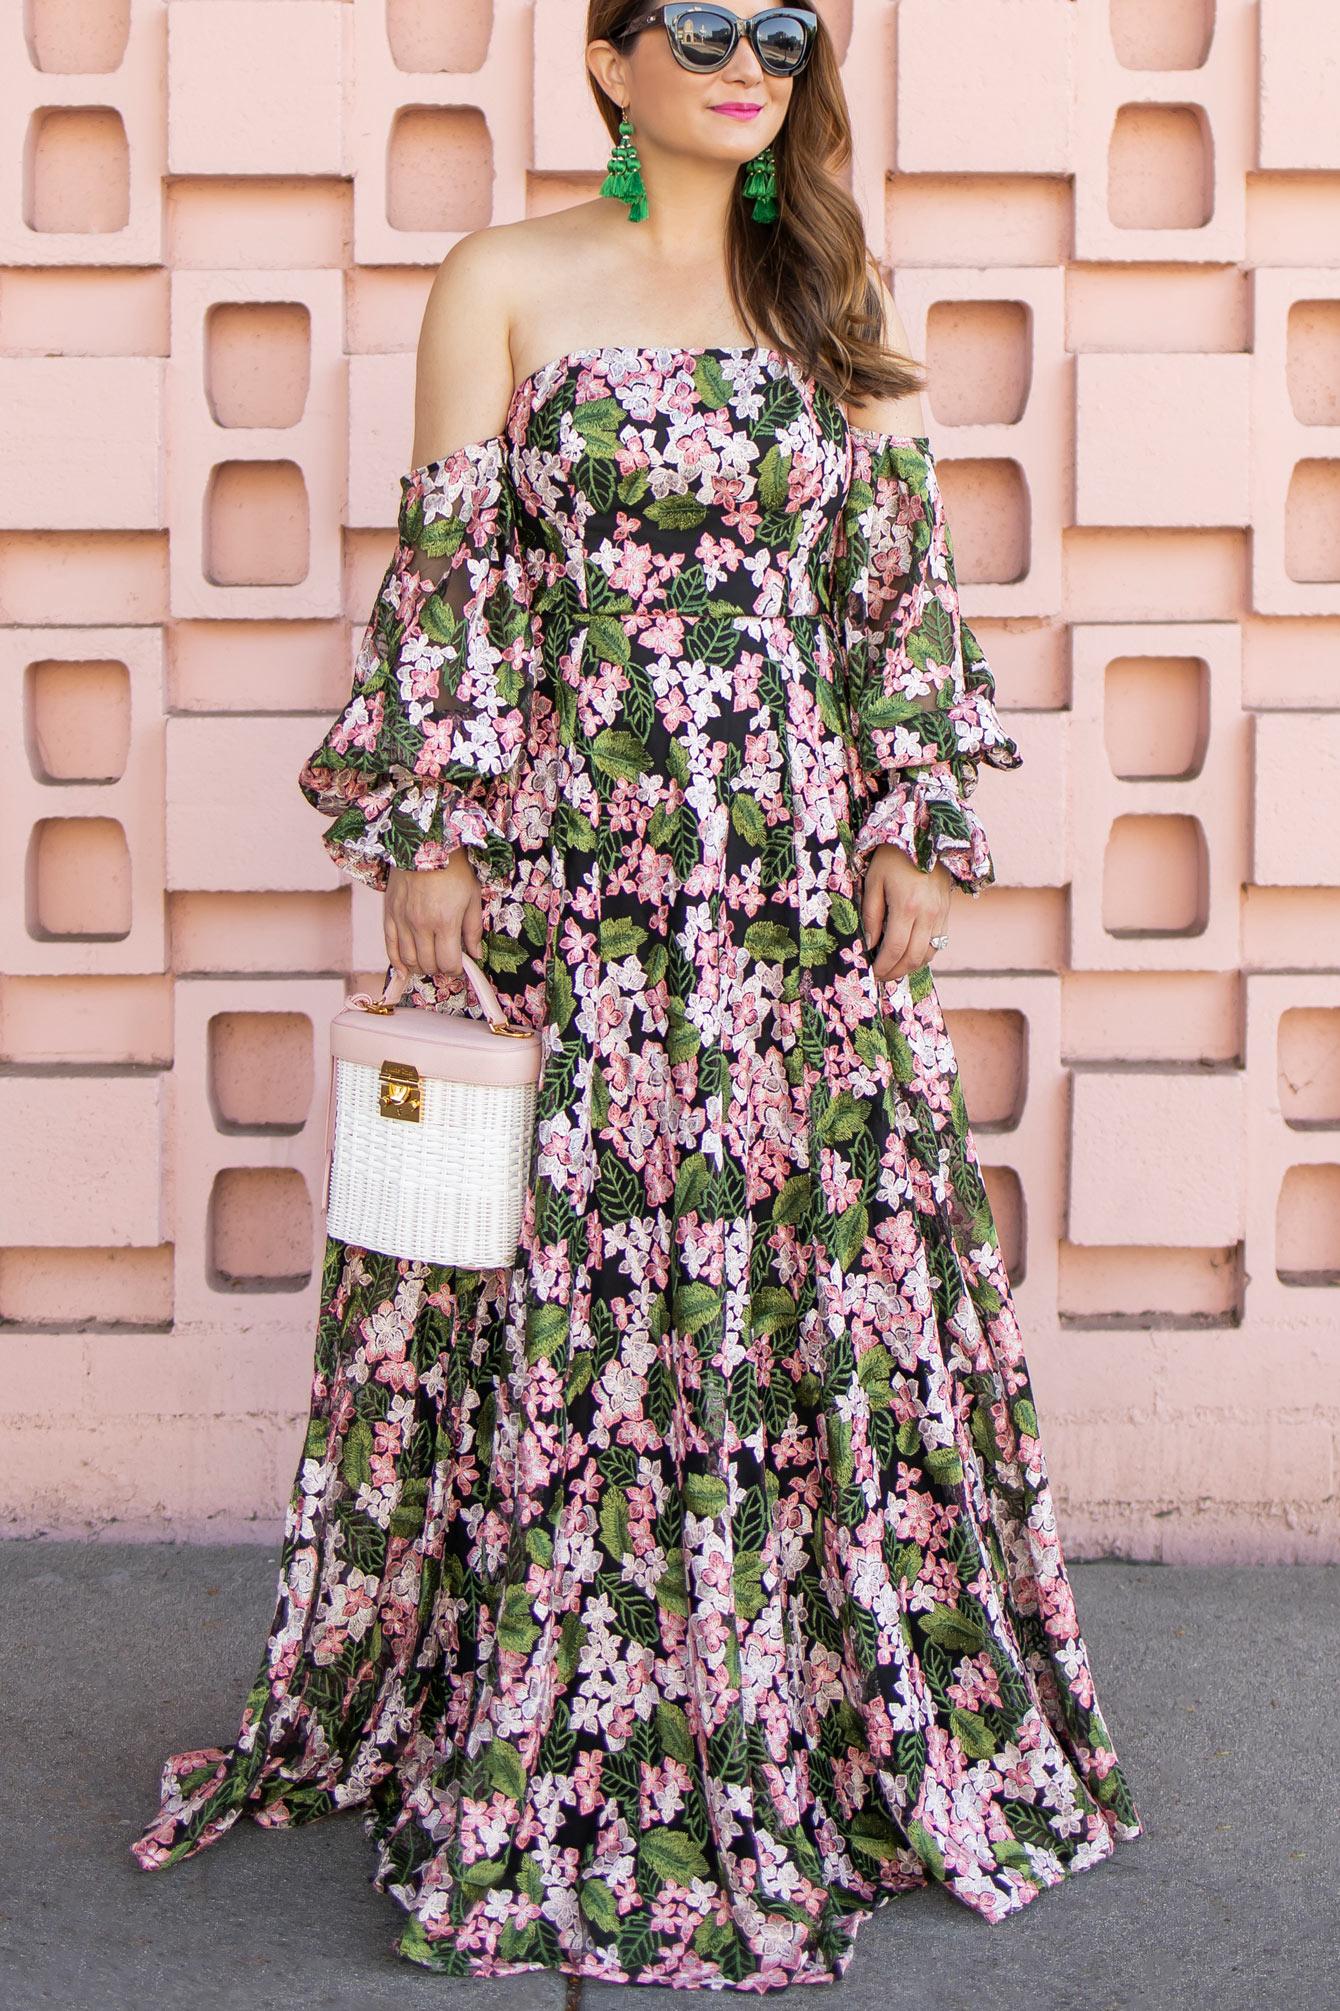 ASOS Floral Lace Maxi Dress